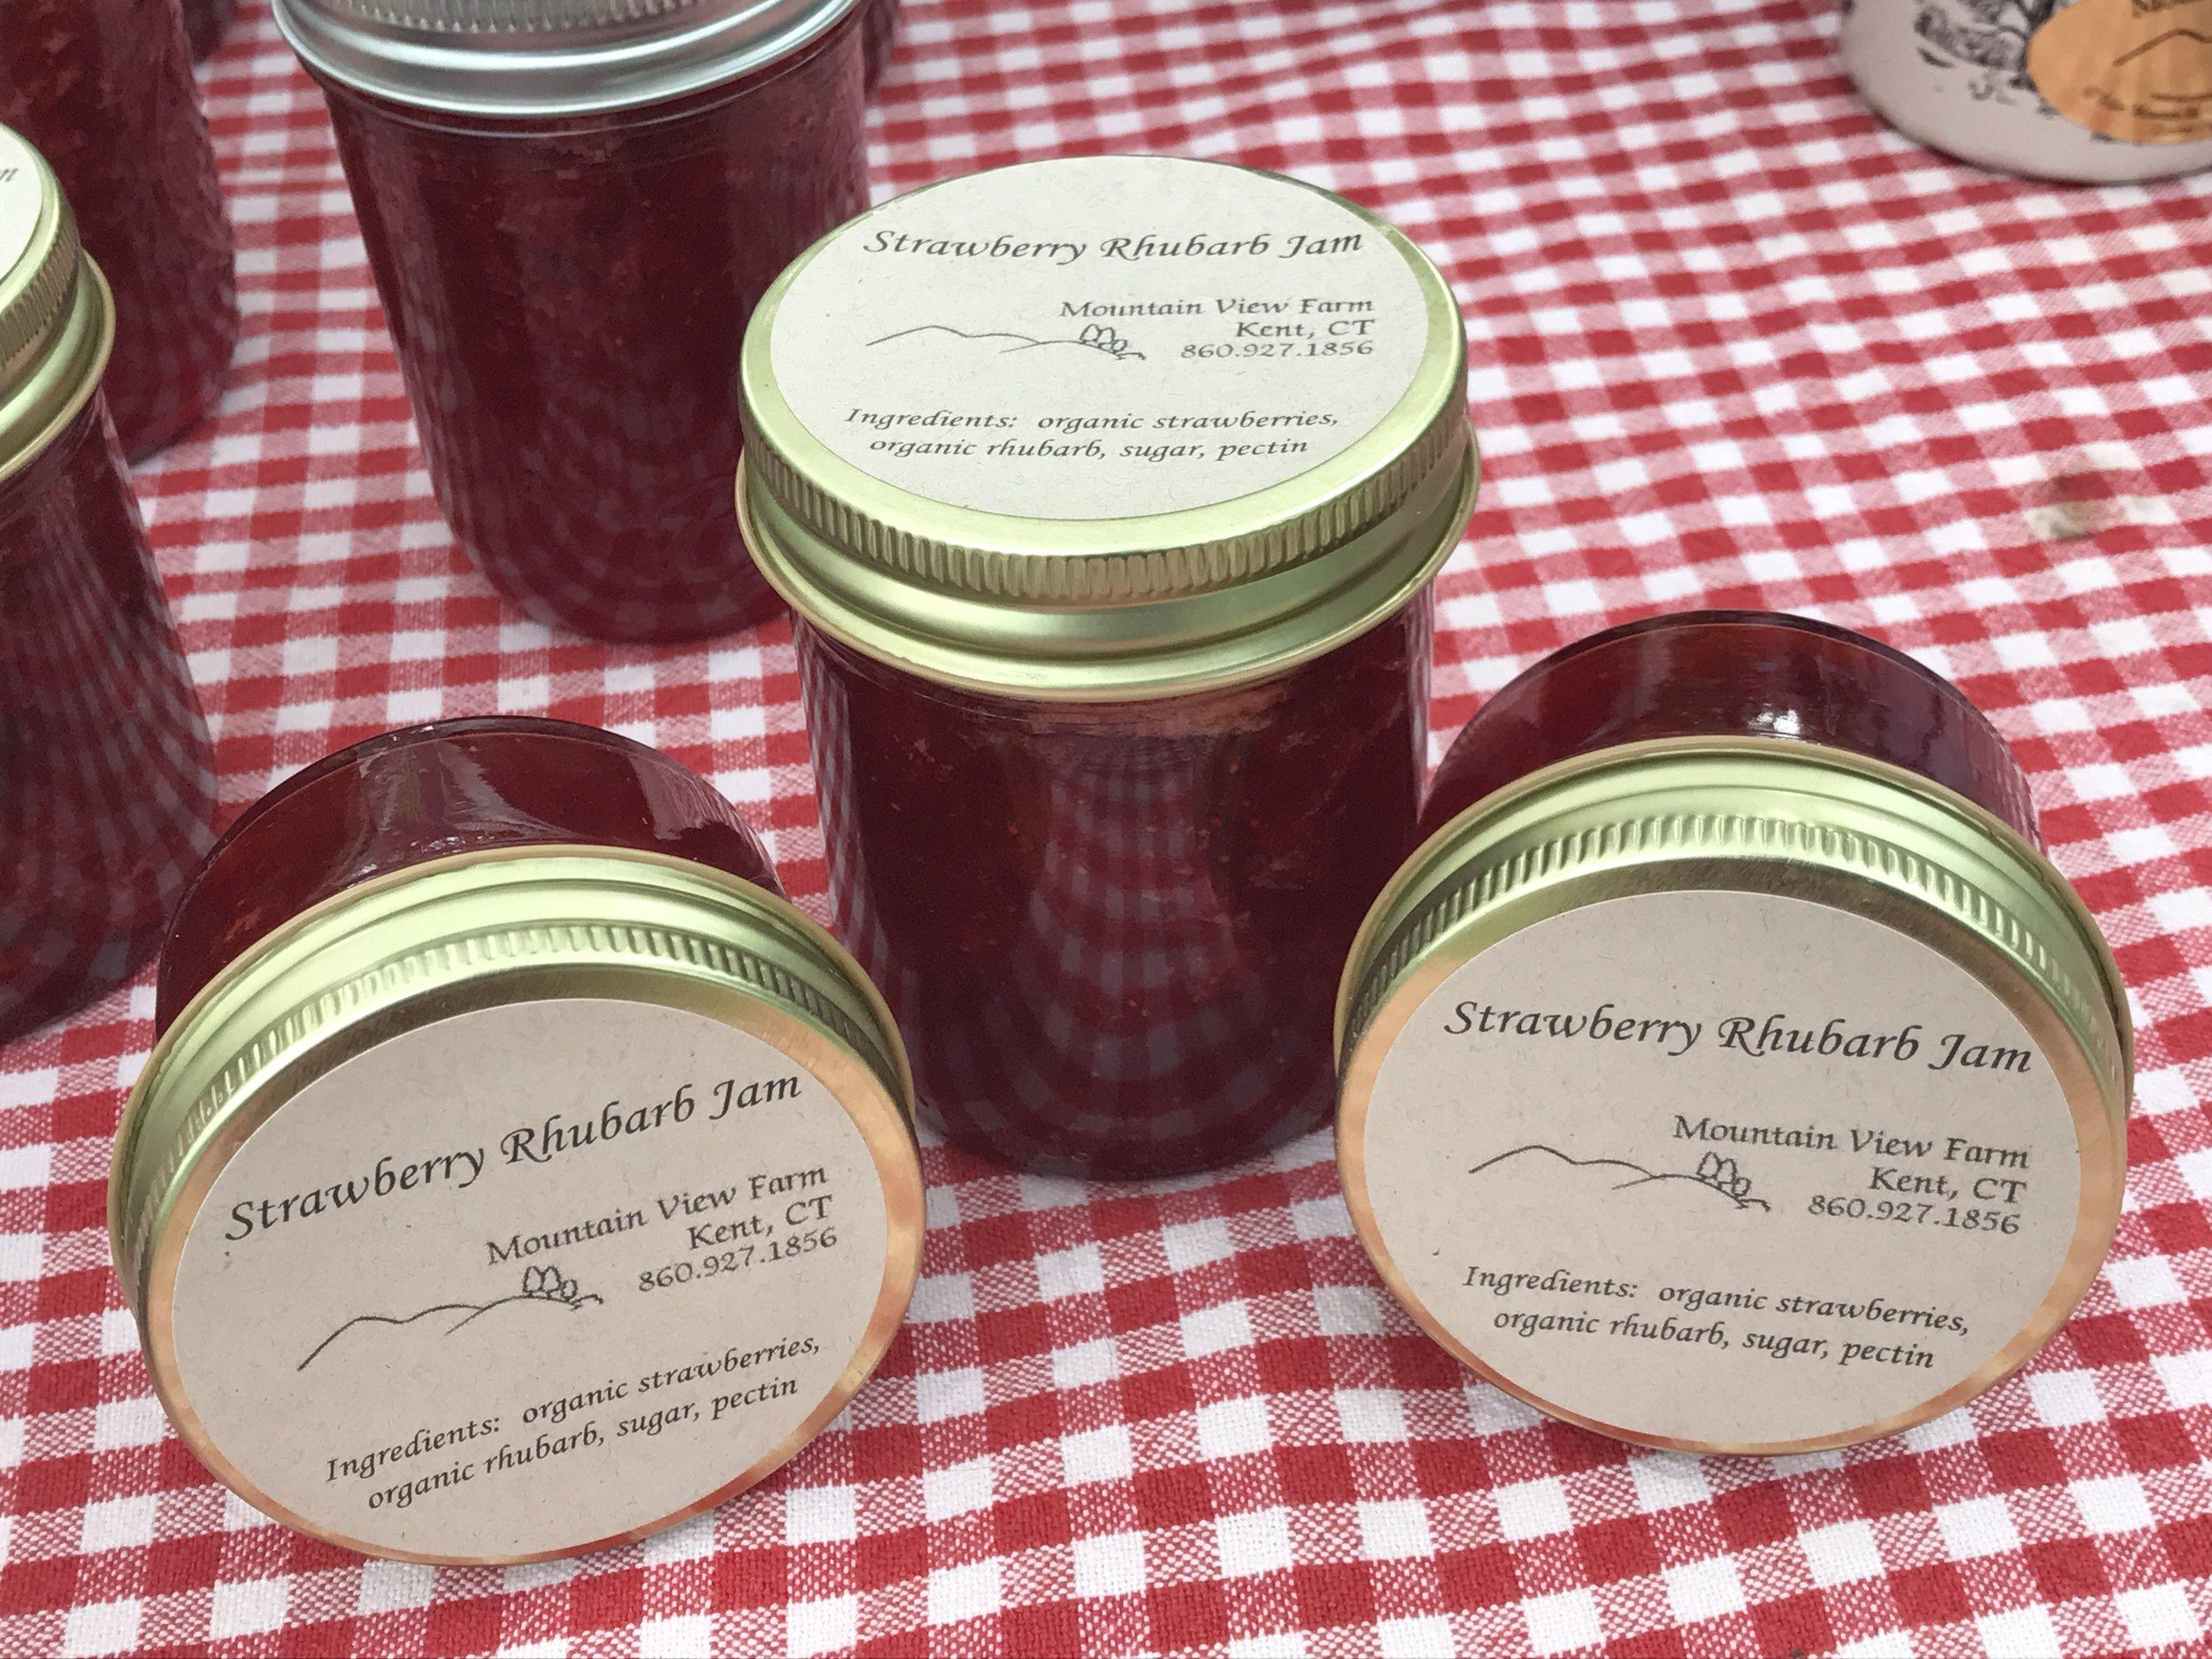 Strawberry Rhubarb Jam.jpg